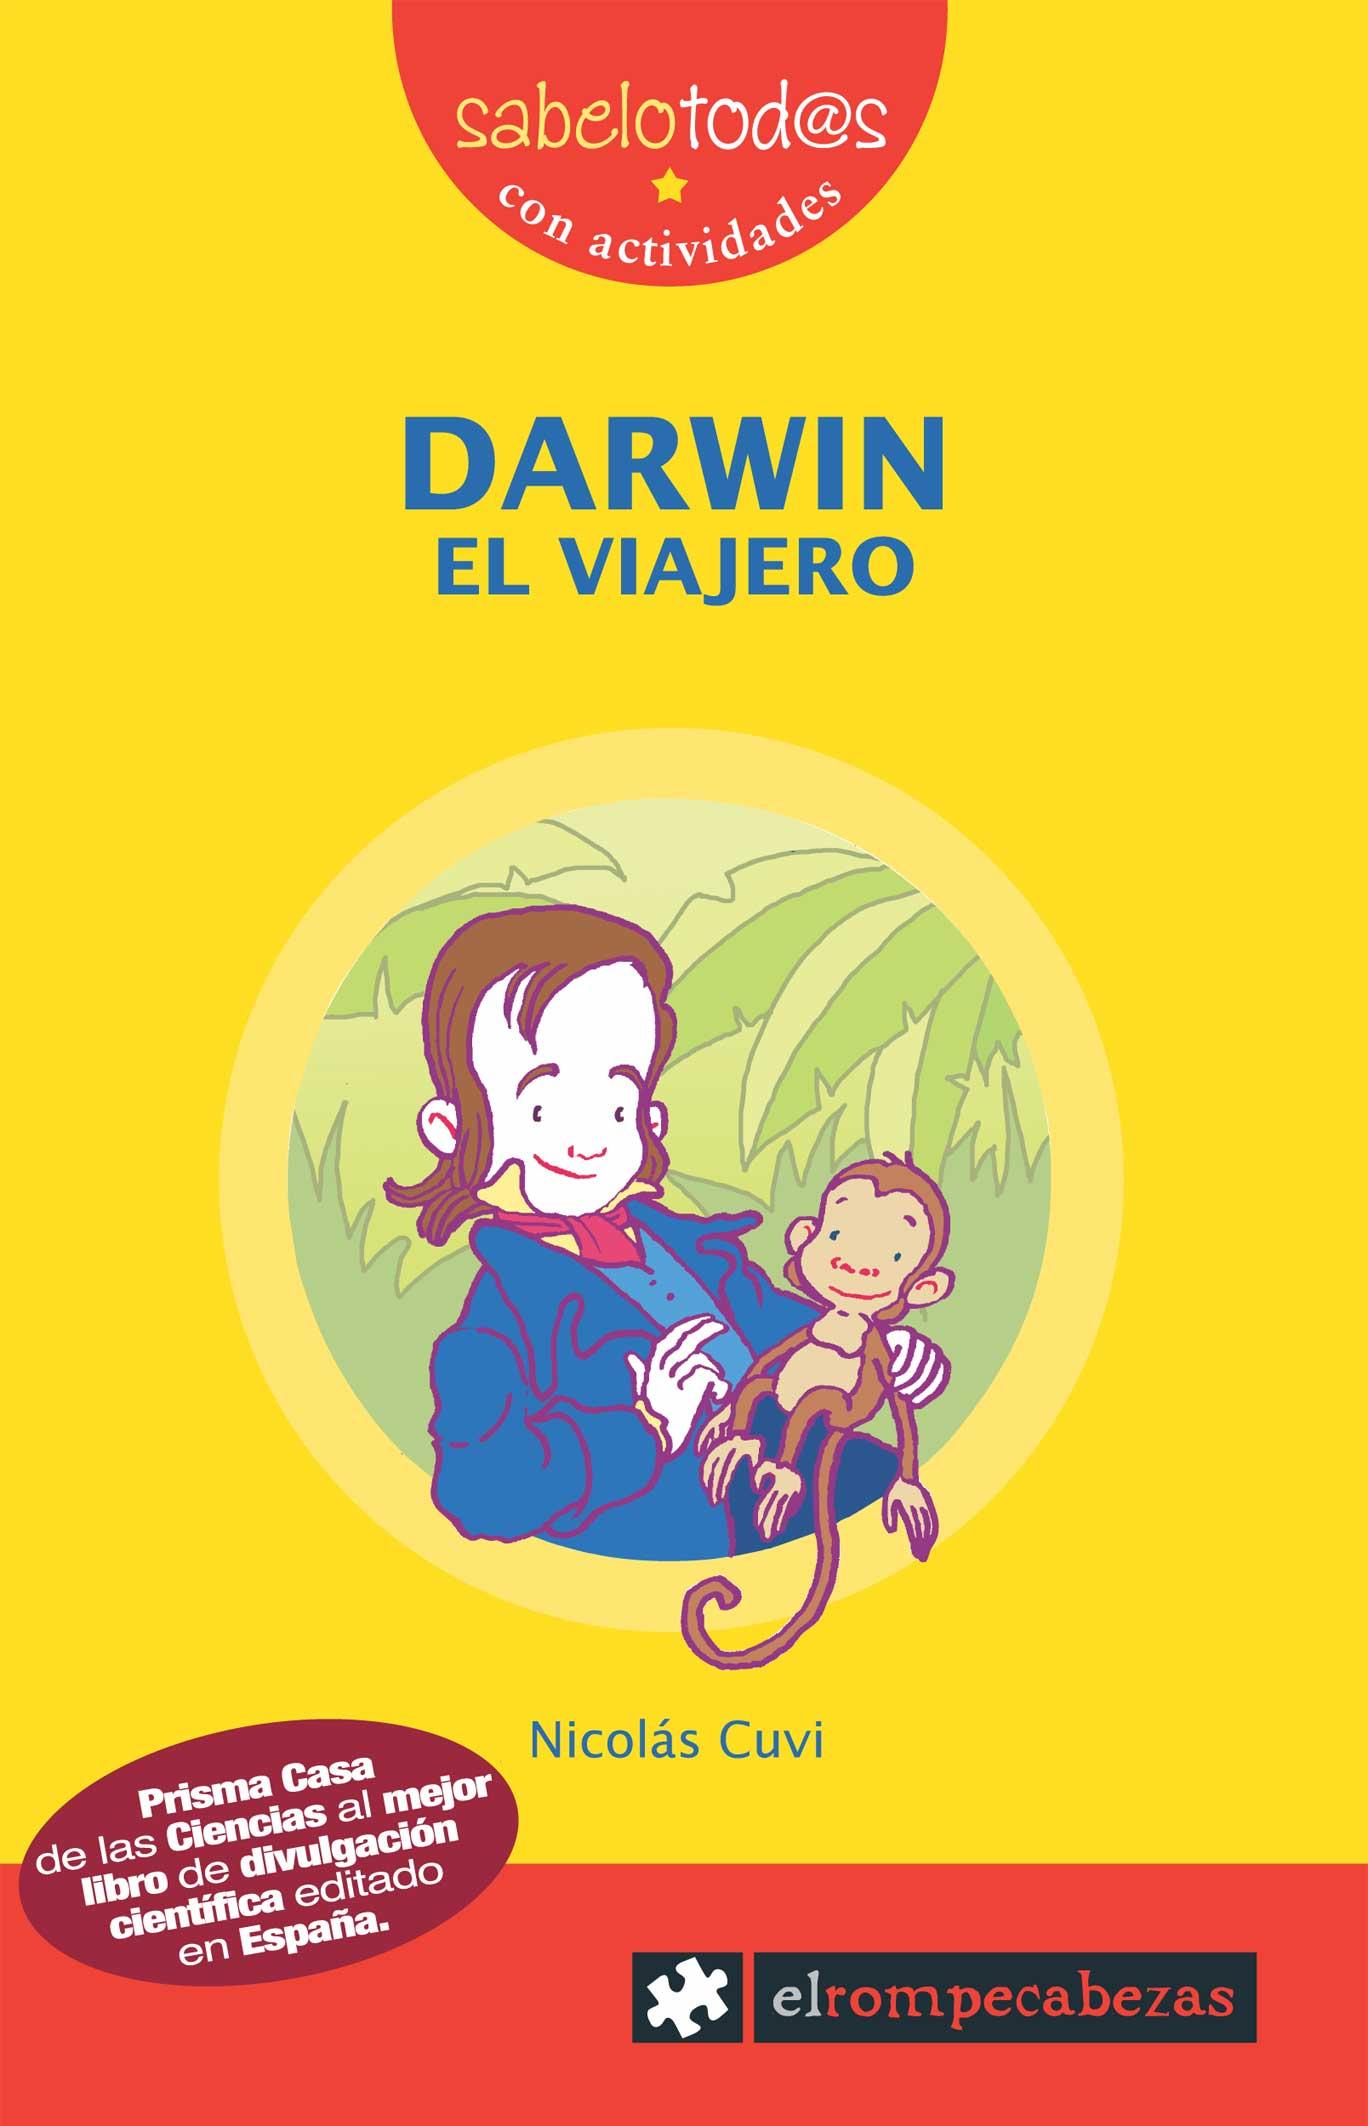 DARWIN el viajero